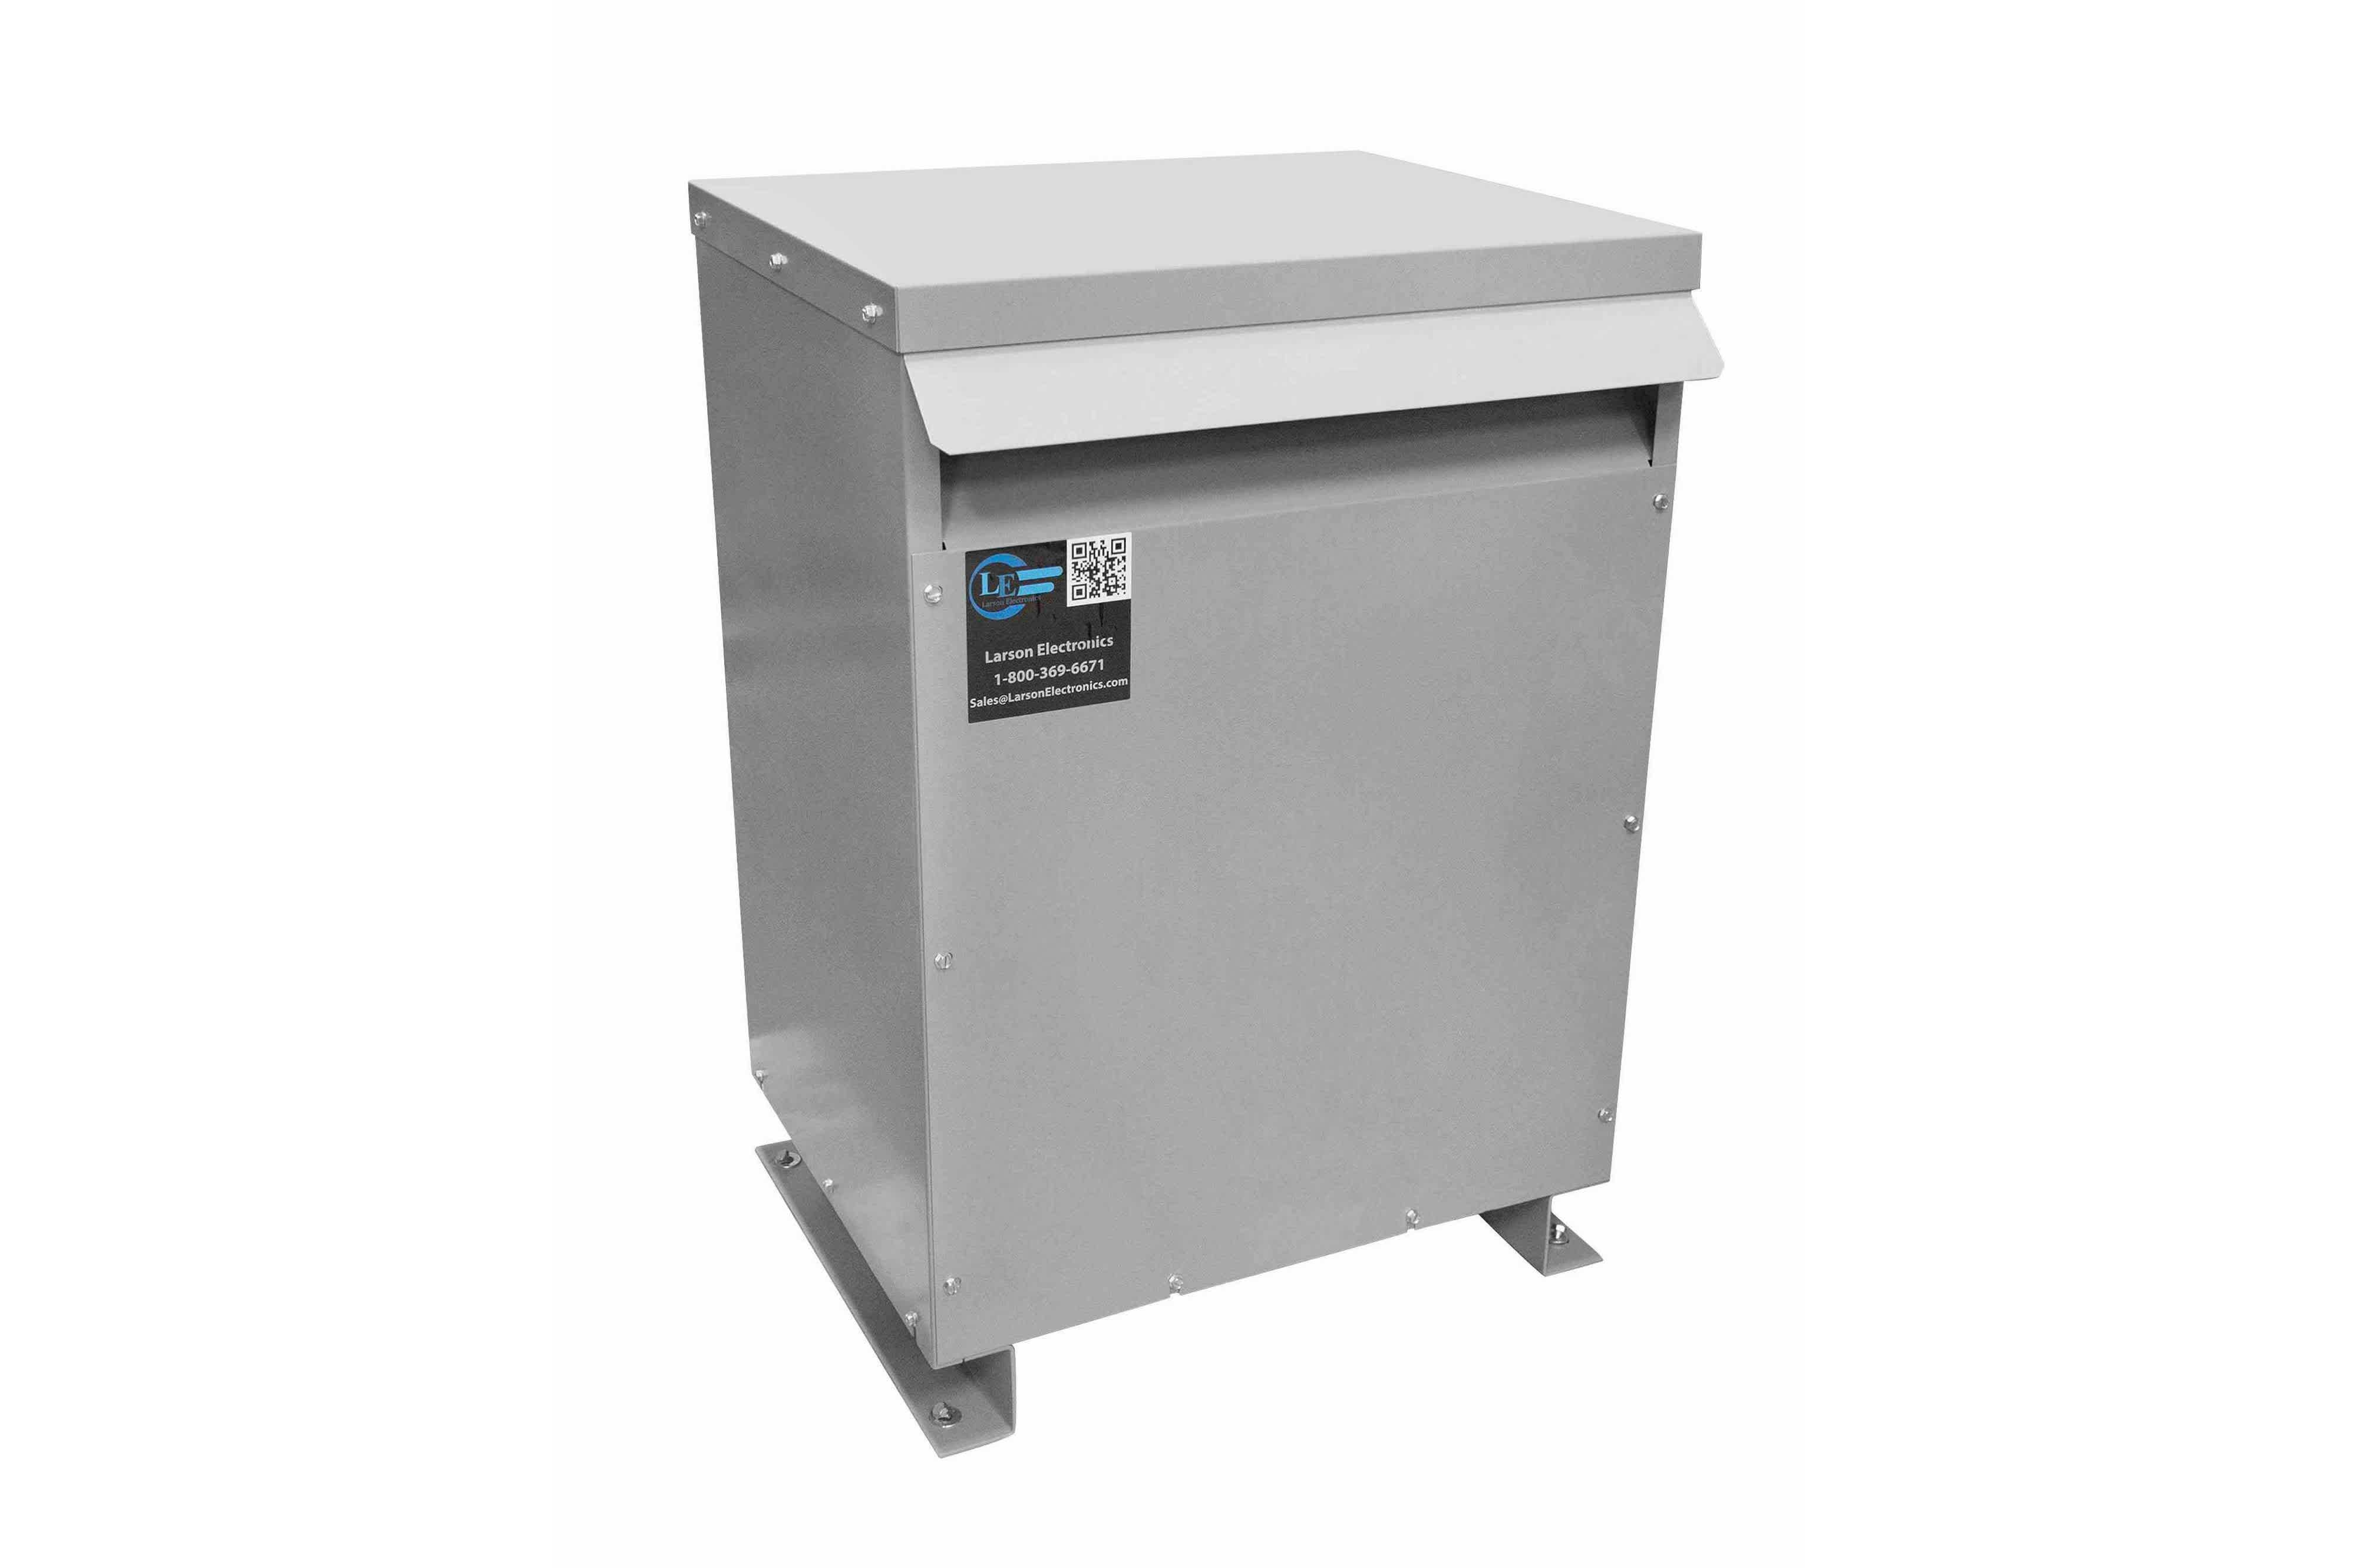 250 kVA 3PH Isolation Transformer, 460V Wye Primary, 380Y/220 Wye-N Secondary, N3R, Ventilated, 60 Hz